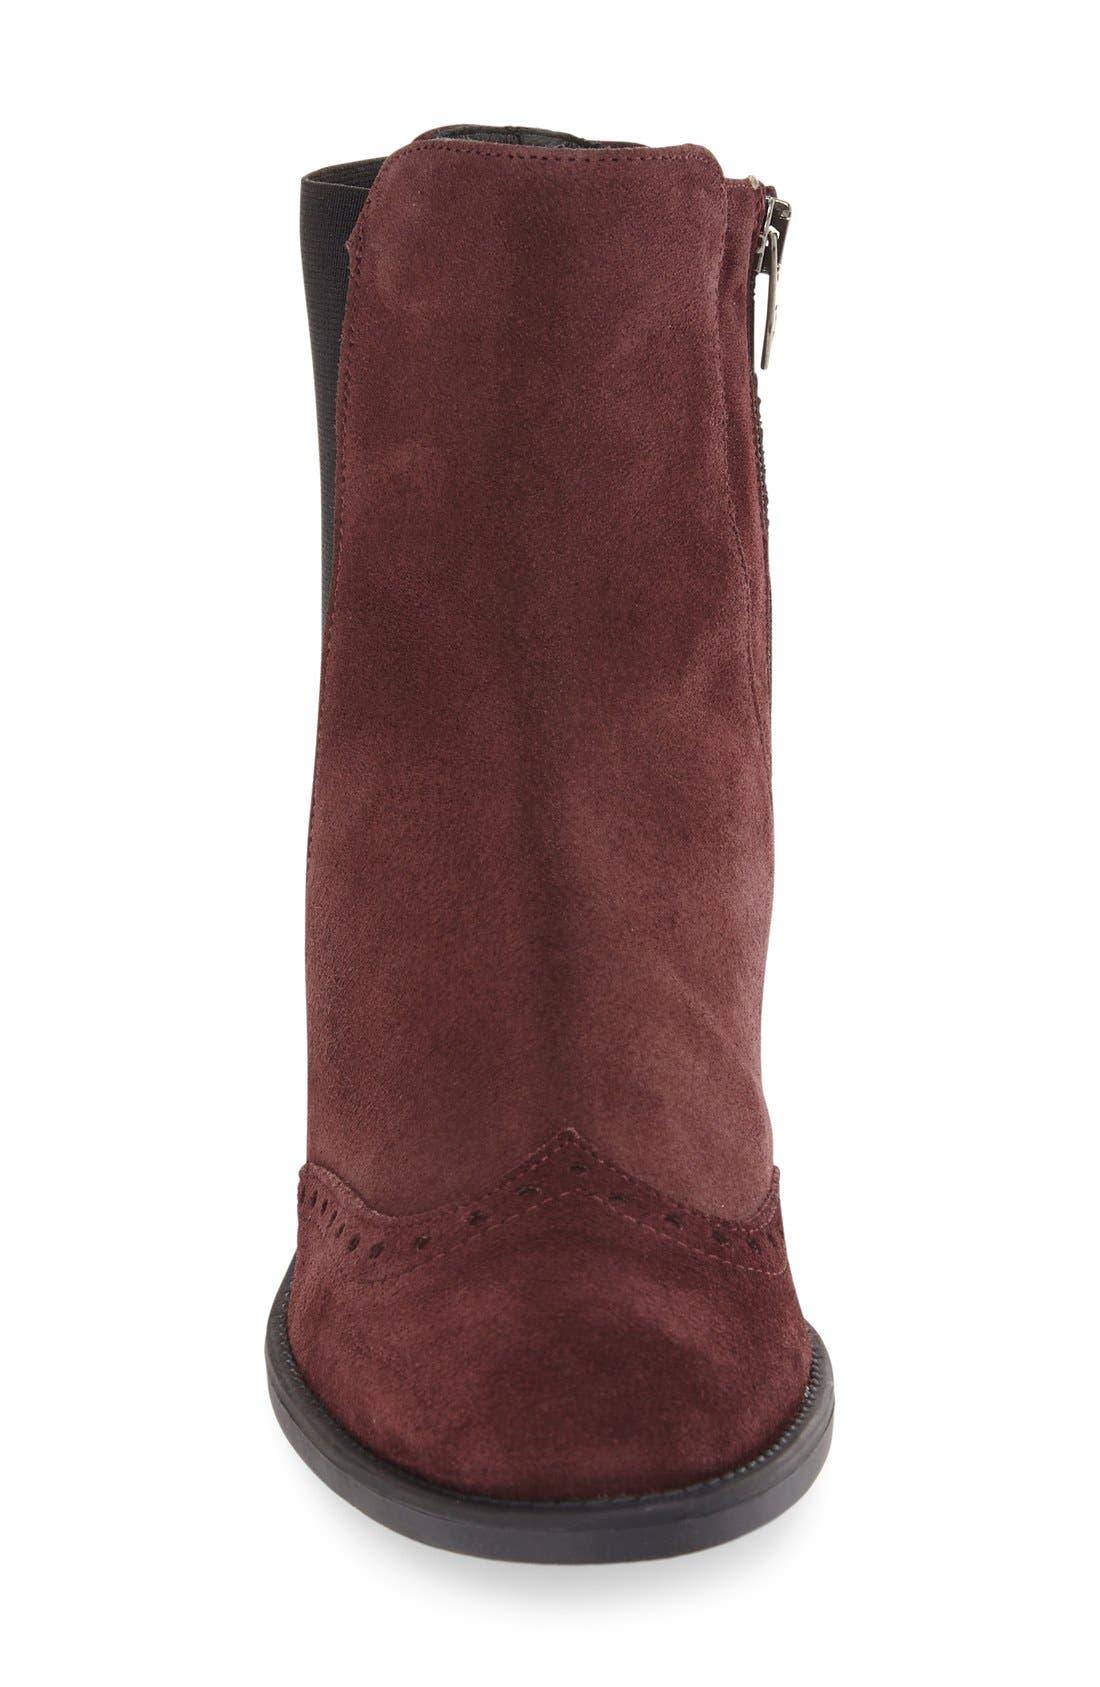 Alternate Image 3  - Toni Pons 'Trieste' Chelsea Boot (Women)